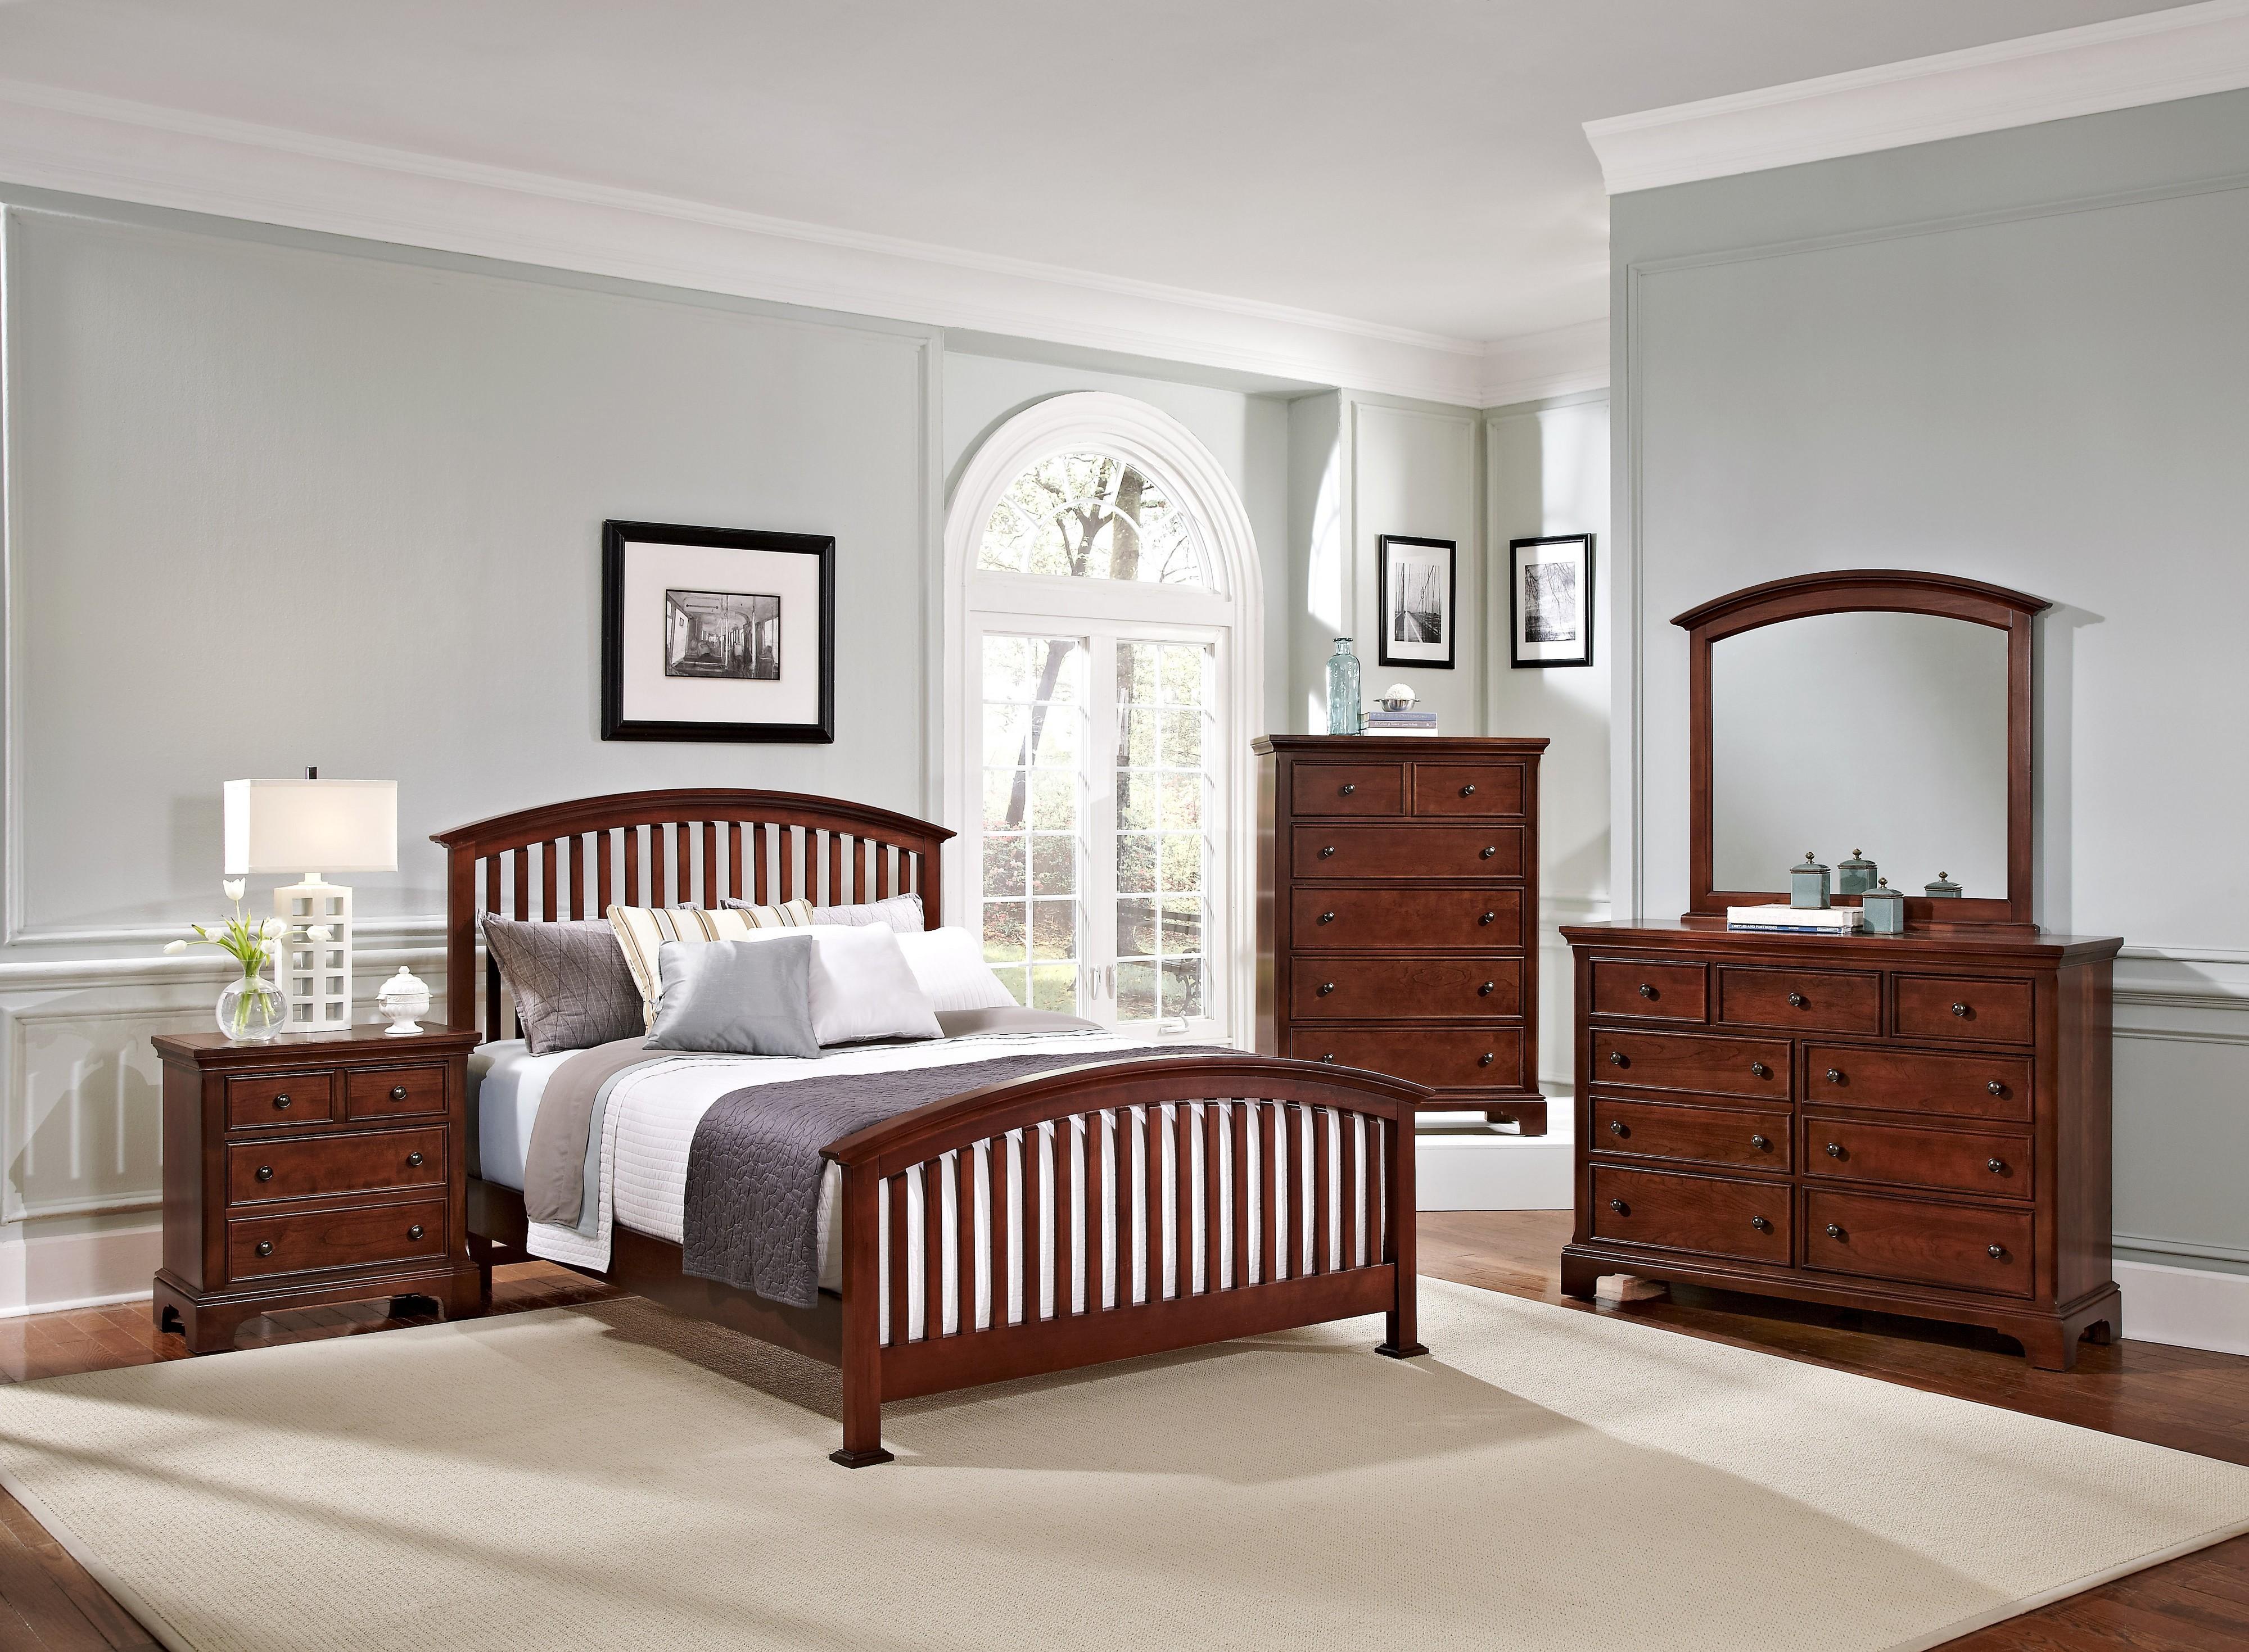 Vaughan Bassett Forsyth King Bedroom Group - Item Number: BB77 K Bedroom Group 3